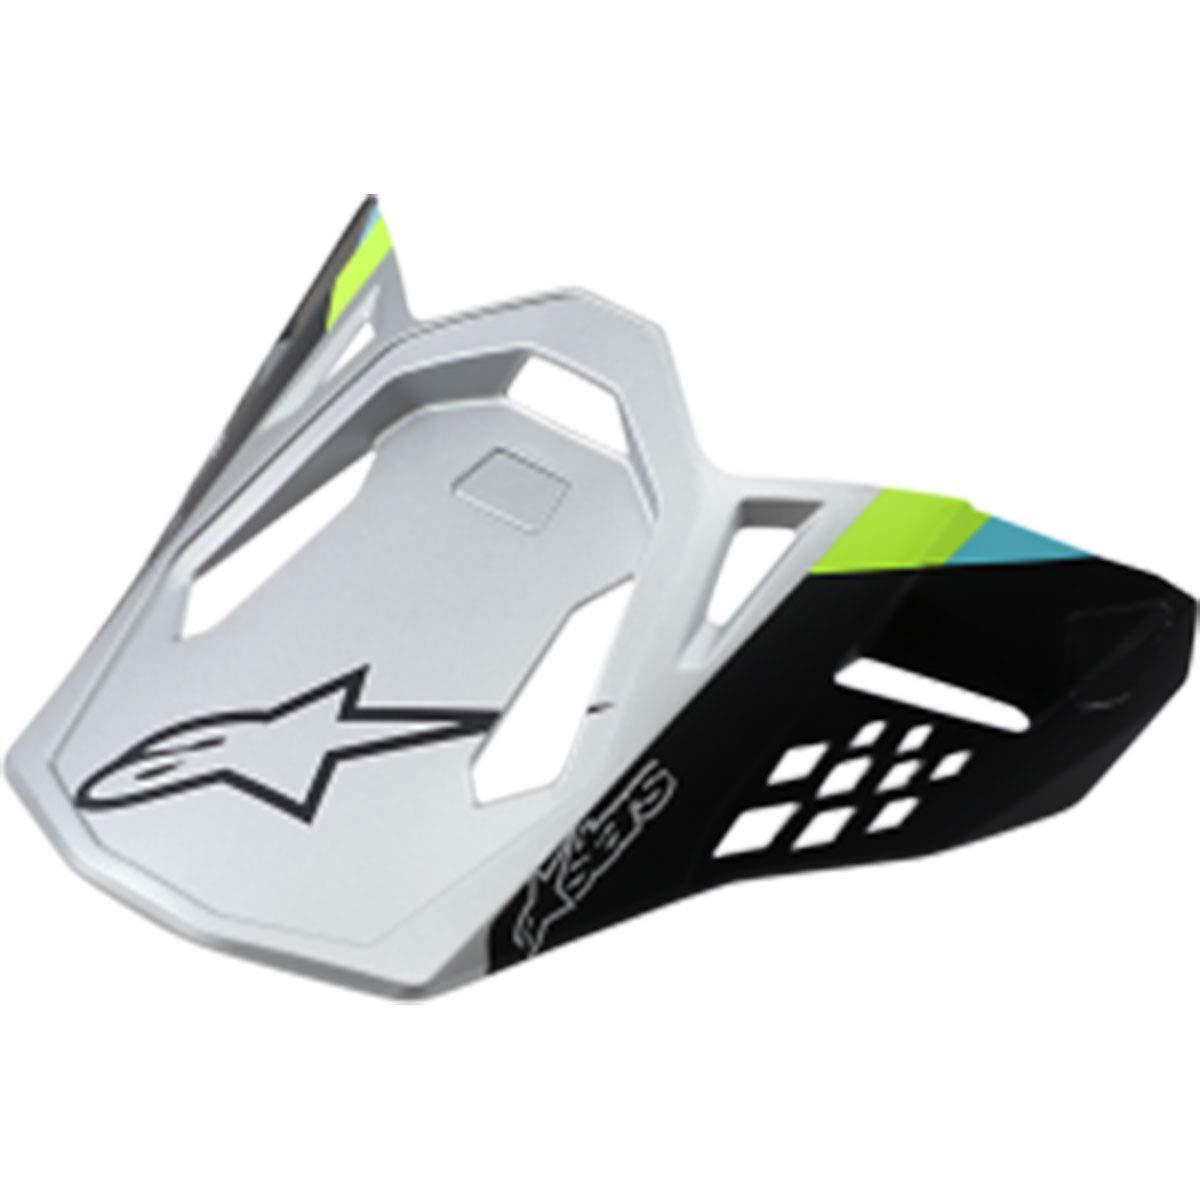 Alpinestars Supertech M8 Contact Visor Off-Road Motorcycle Helmet Accessories - Matte Silver/One Size